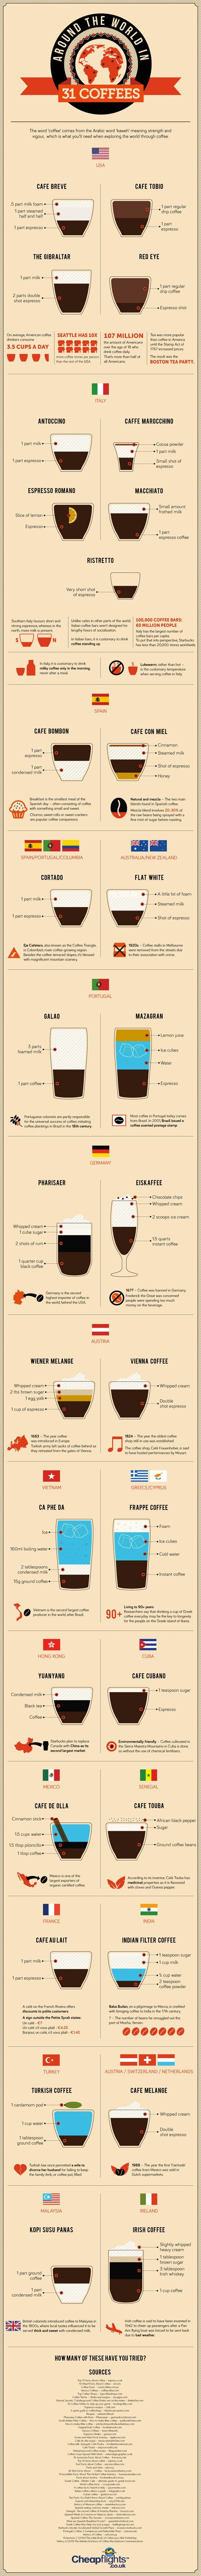 Around the world (31 Coffees)